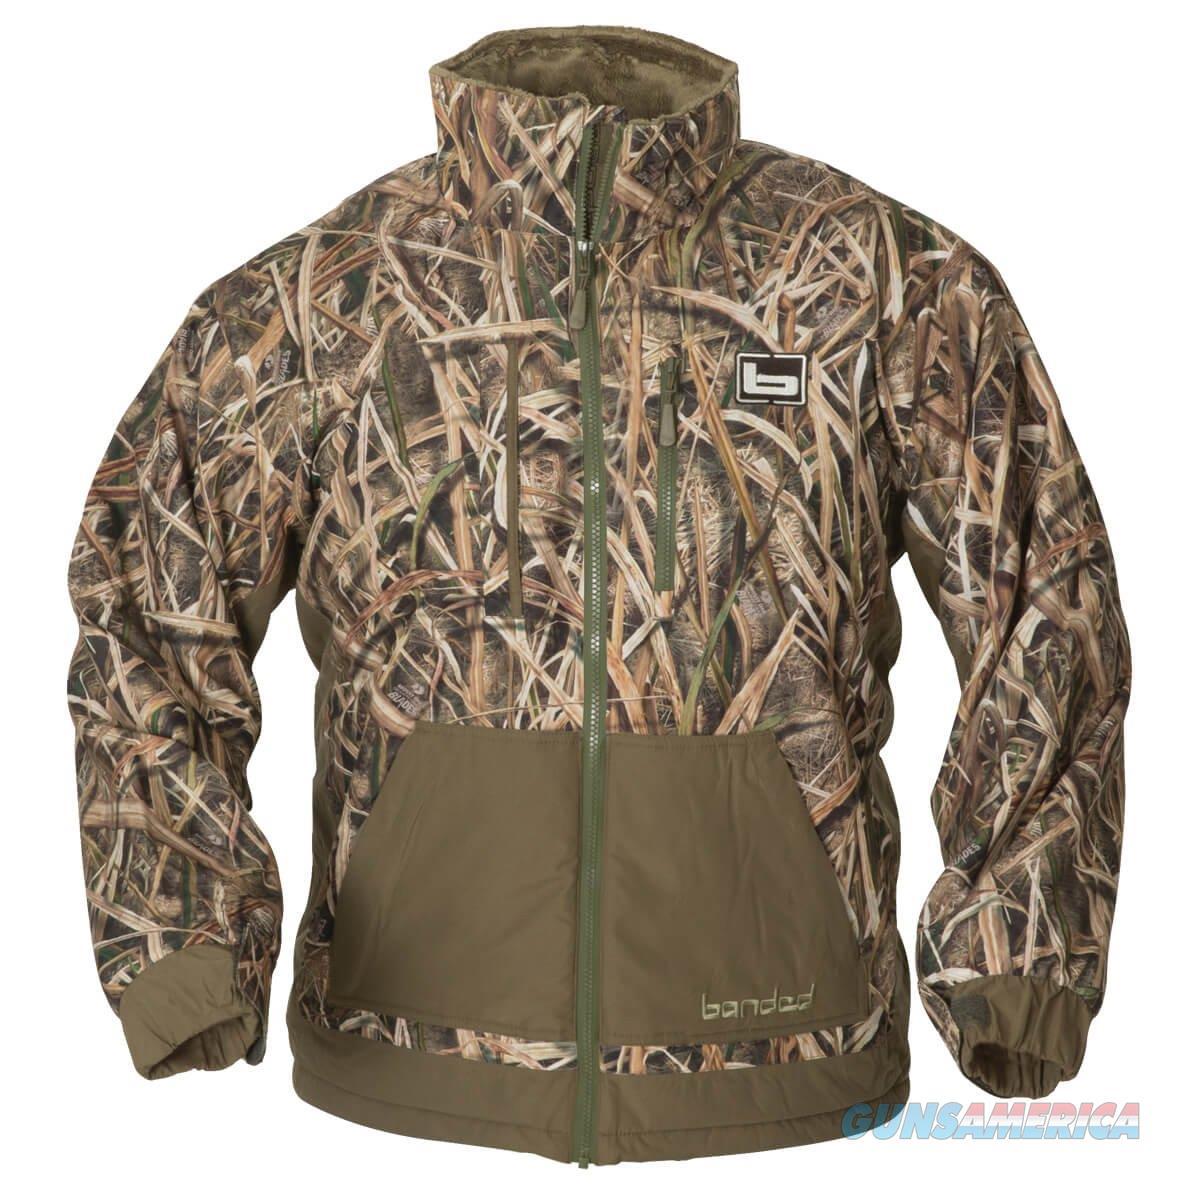 Banded Chesapeake Pullover Blades 2XL  Non-Guns > Shotgun Sports > Vests/Jackets